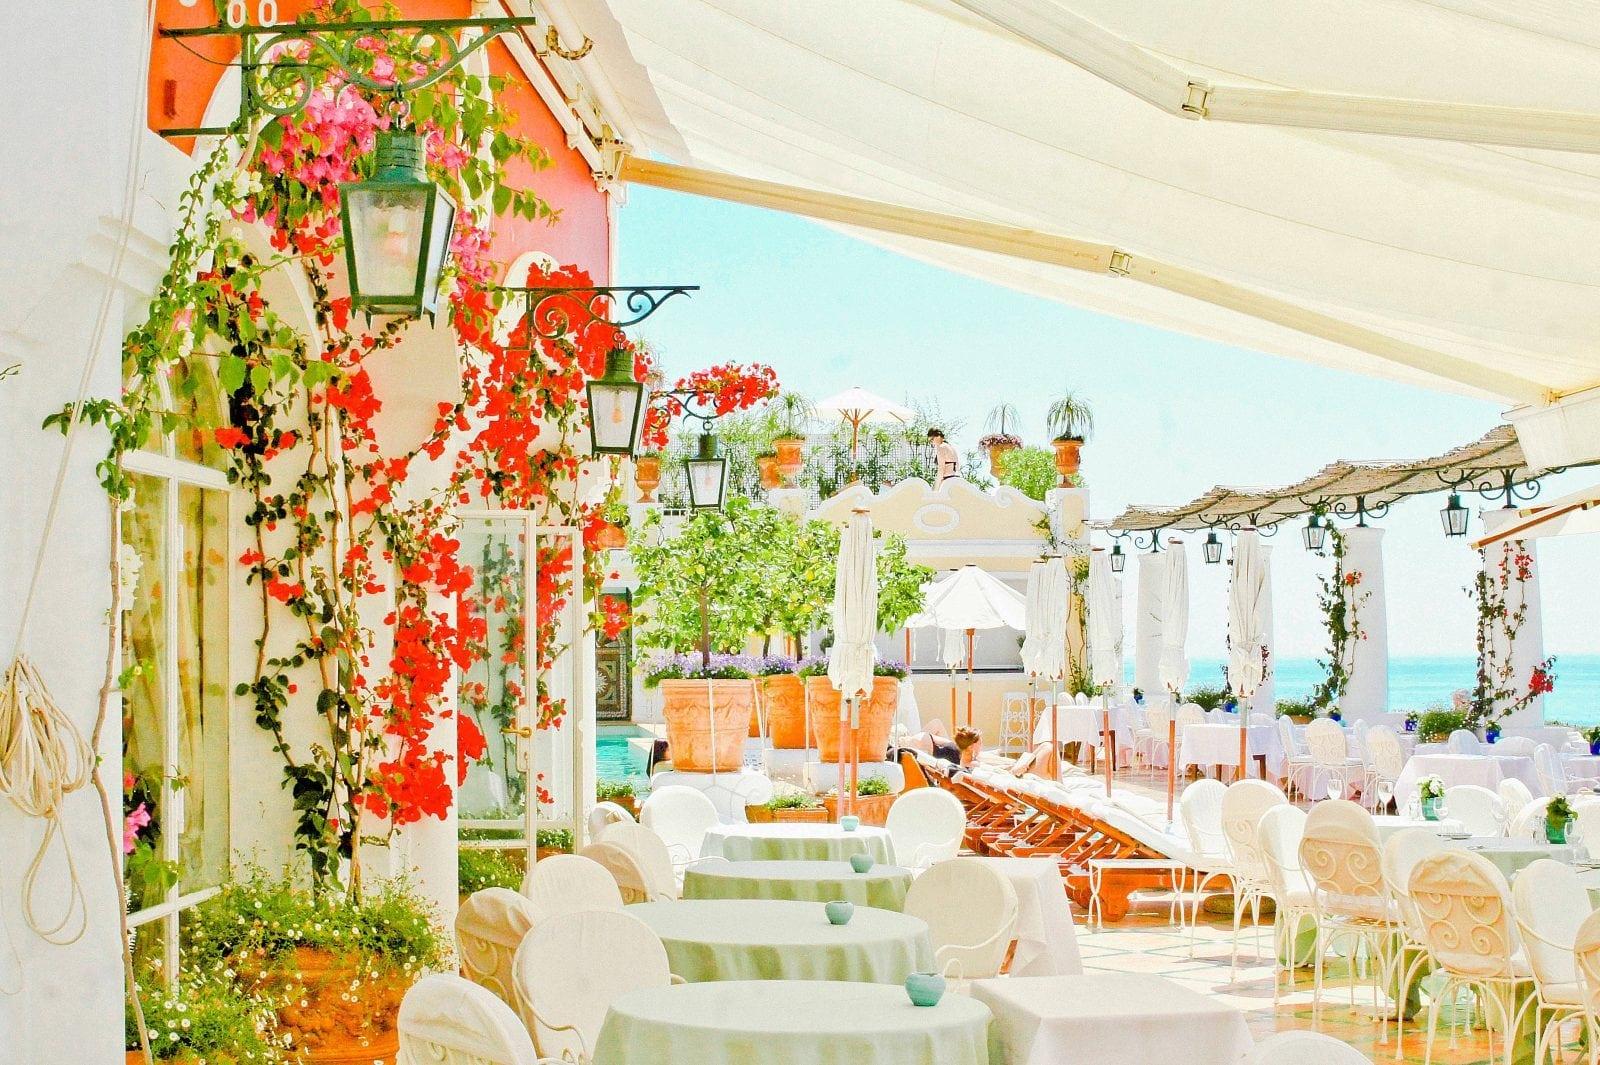 Le Sirenuse15 - Le Sirenuse, Positano - istorie și ospitalitate italiană